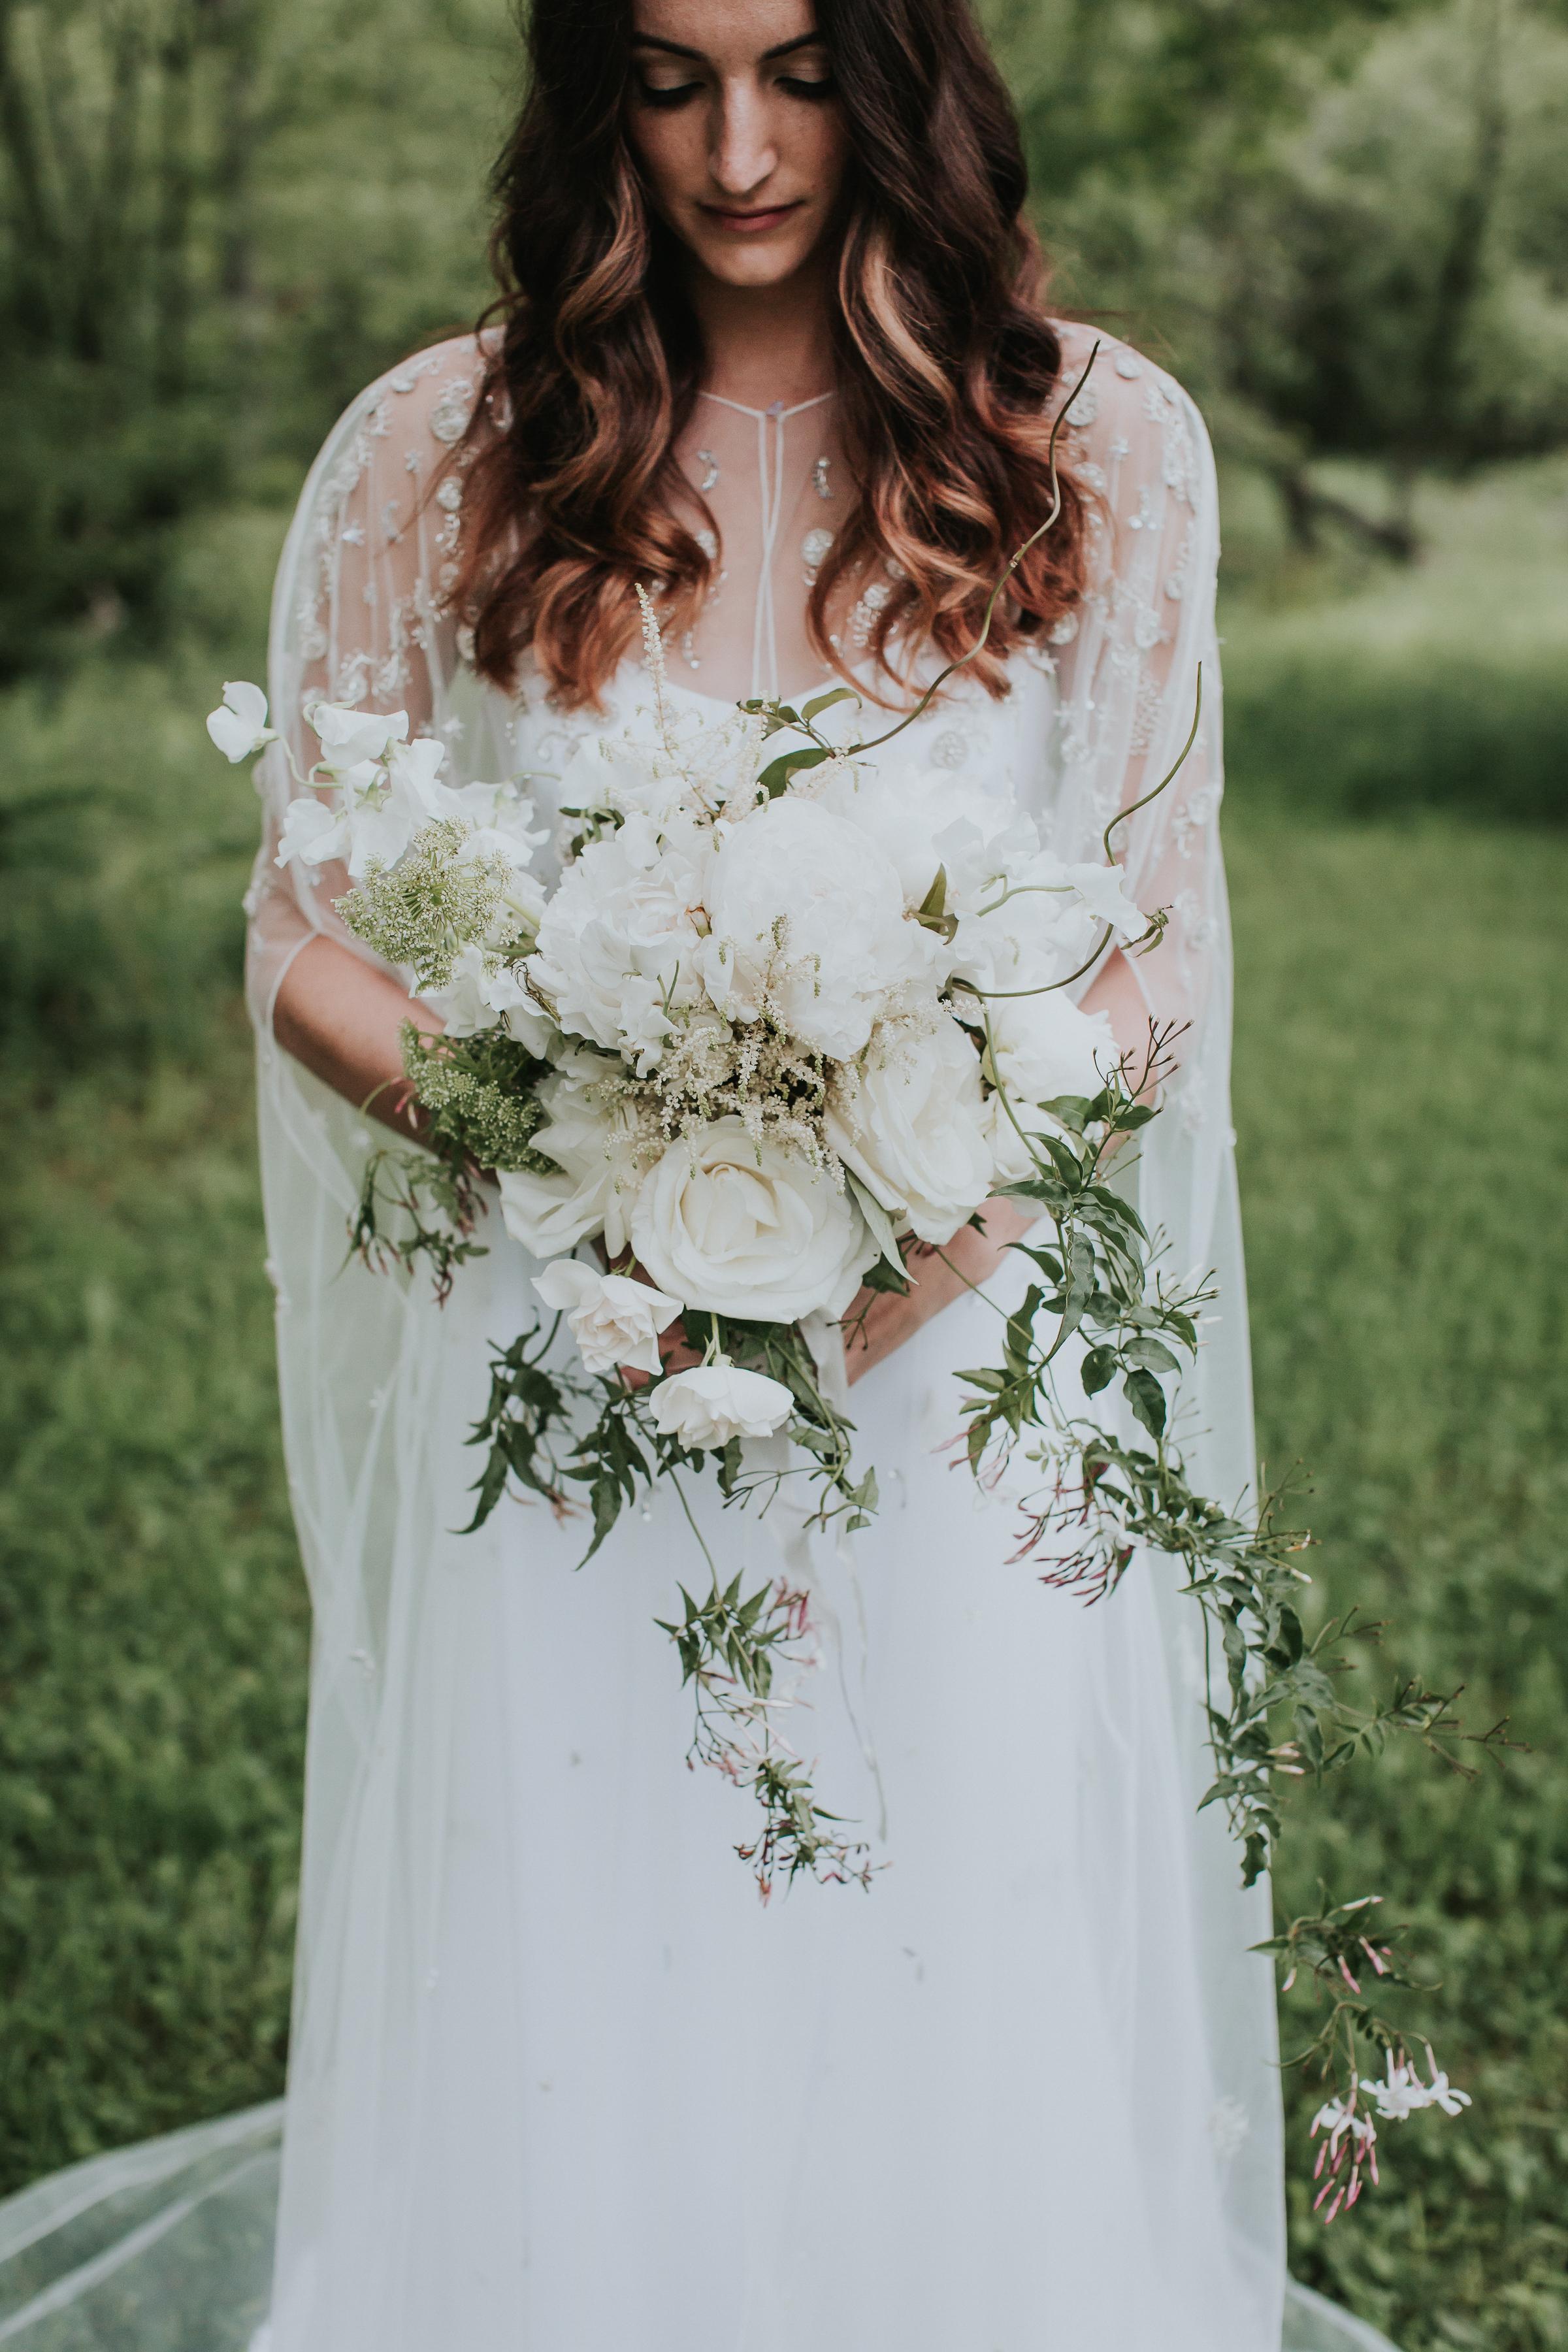 Handsome-Hollow-Long-Eddy-Catskills-New-York-Fine-Art-Documentary-Wedding-Photographer-45.jpg